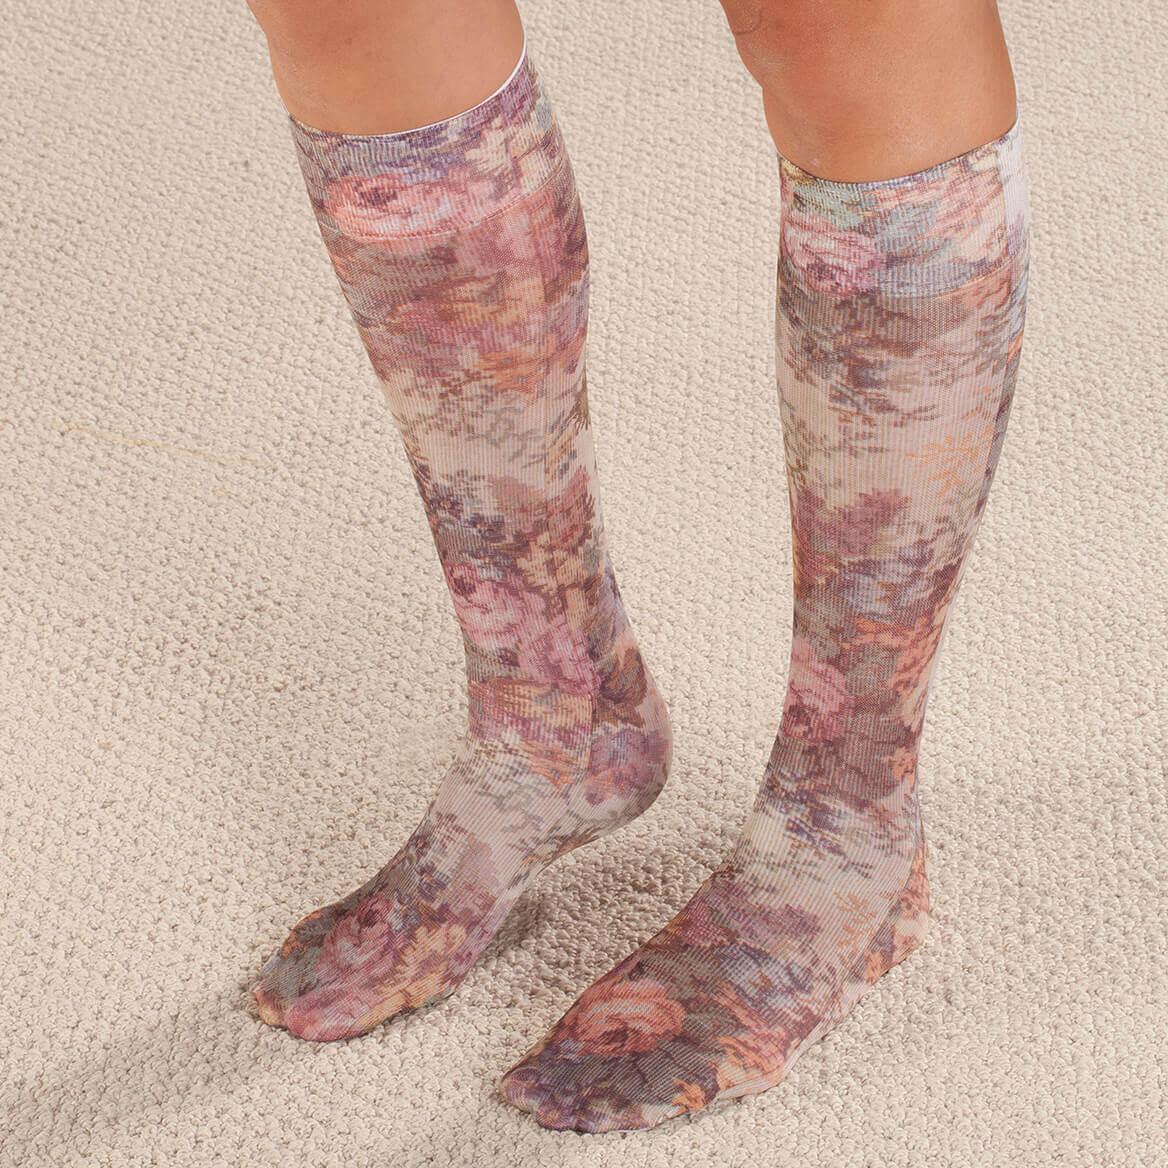 Celeste Stein Compression Socks, 15-20 mmHg-352878